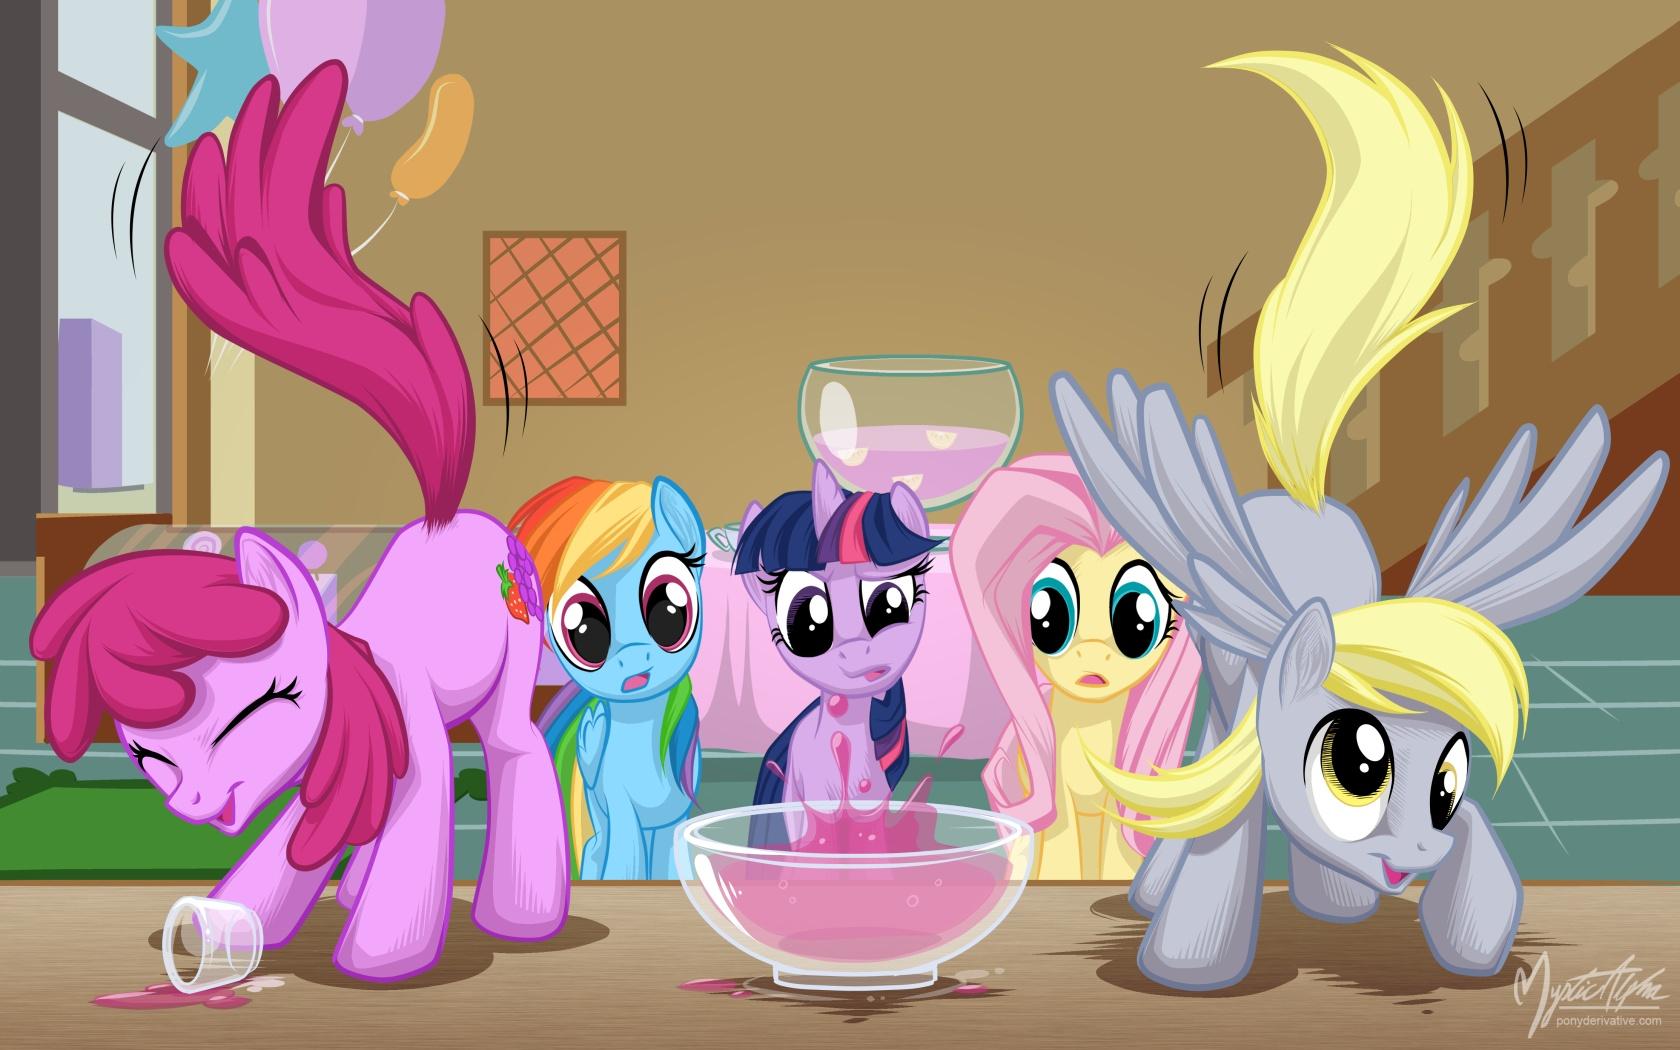 DUMP-my-little-pony-friendship-is-magic-31531467-1680-1050